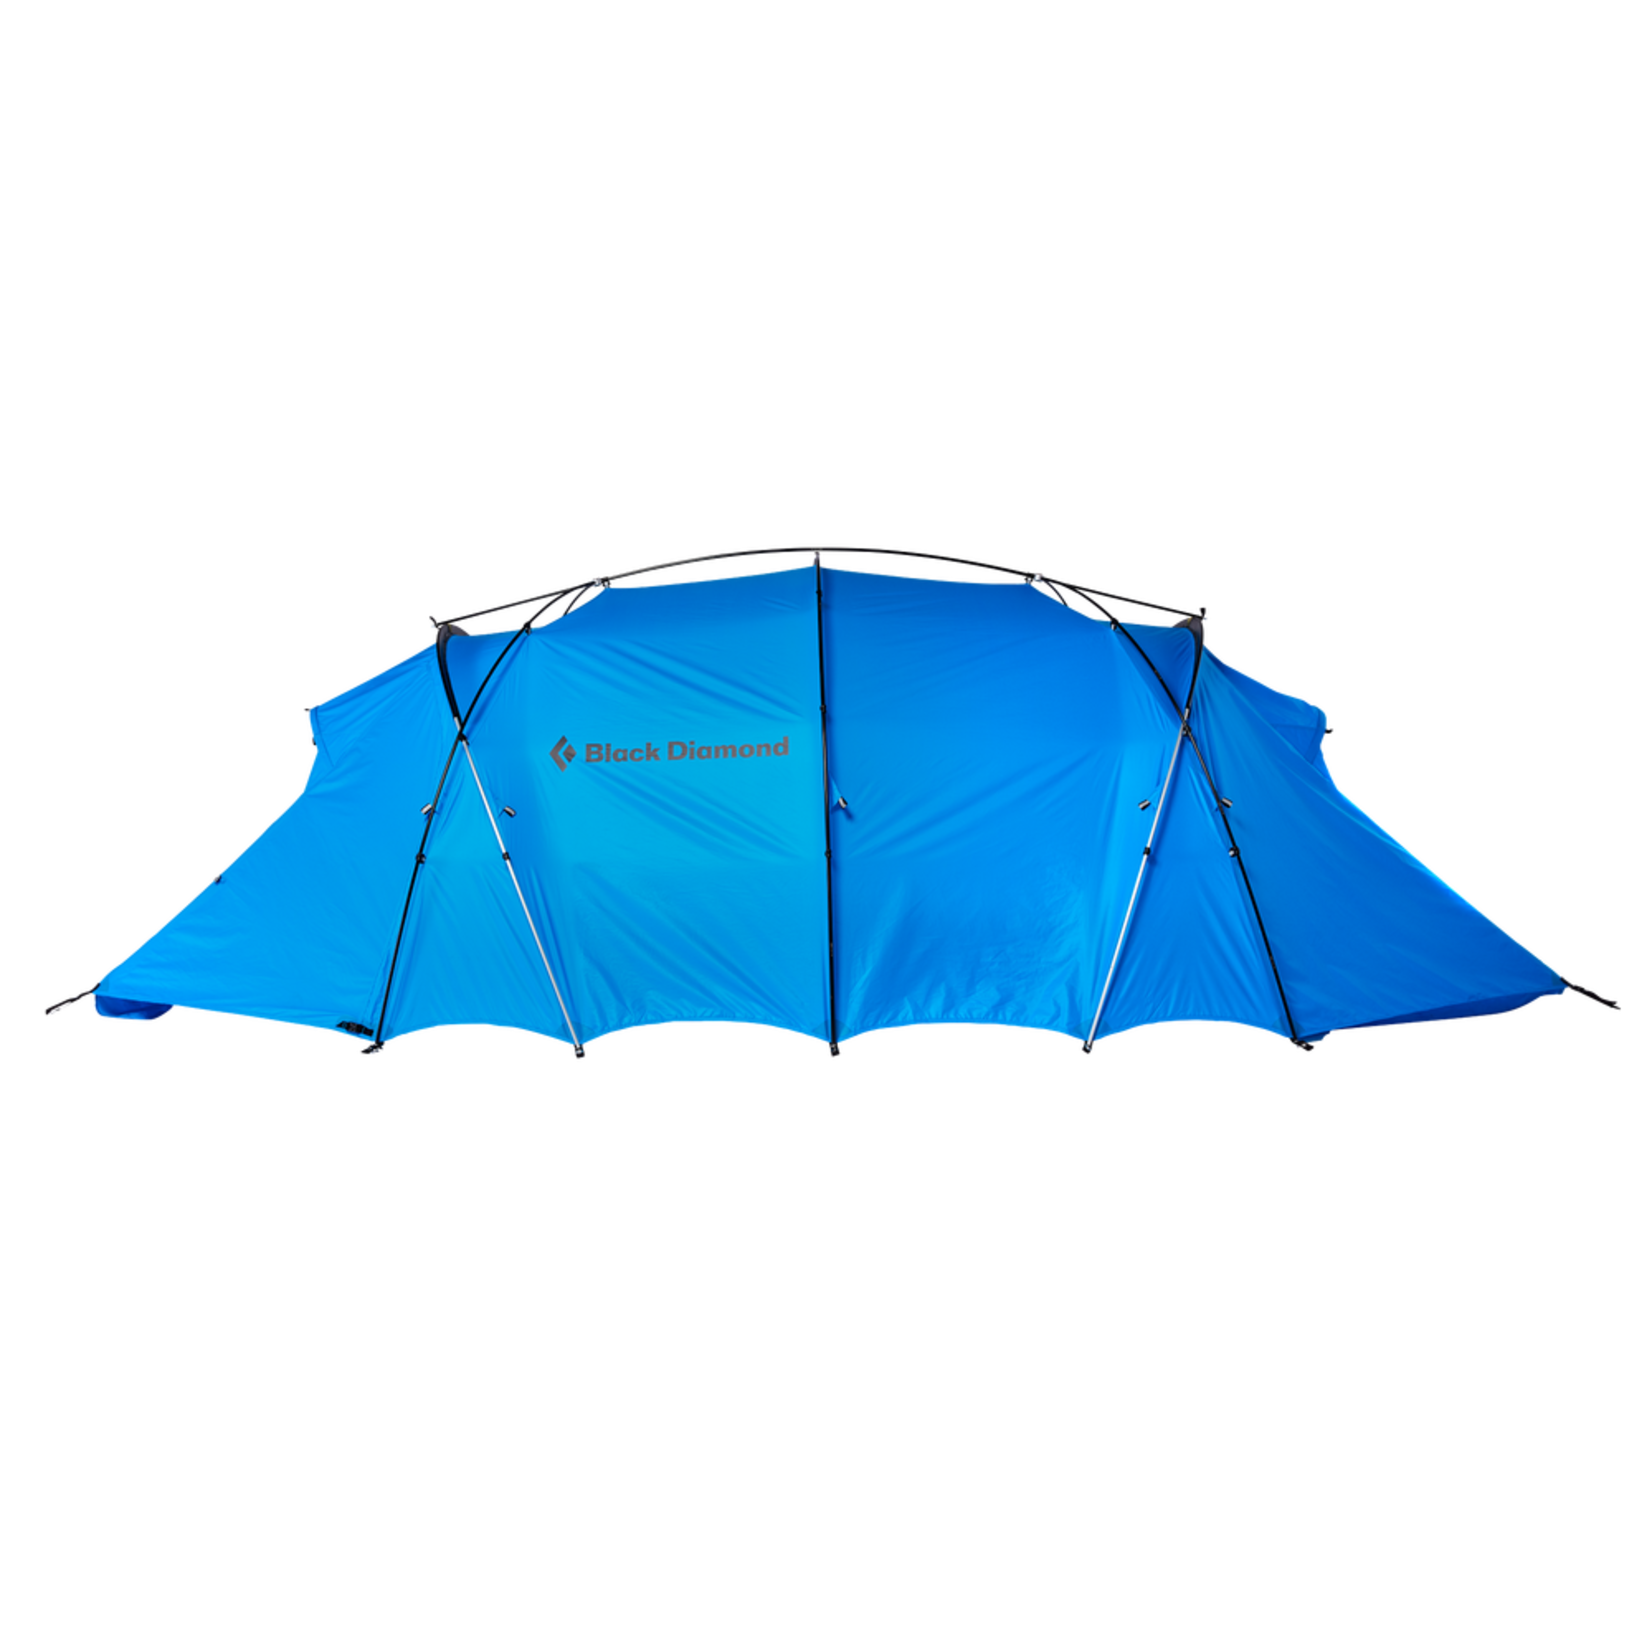 Black Diamond Black Diamond Mission 2P Tent